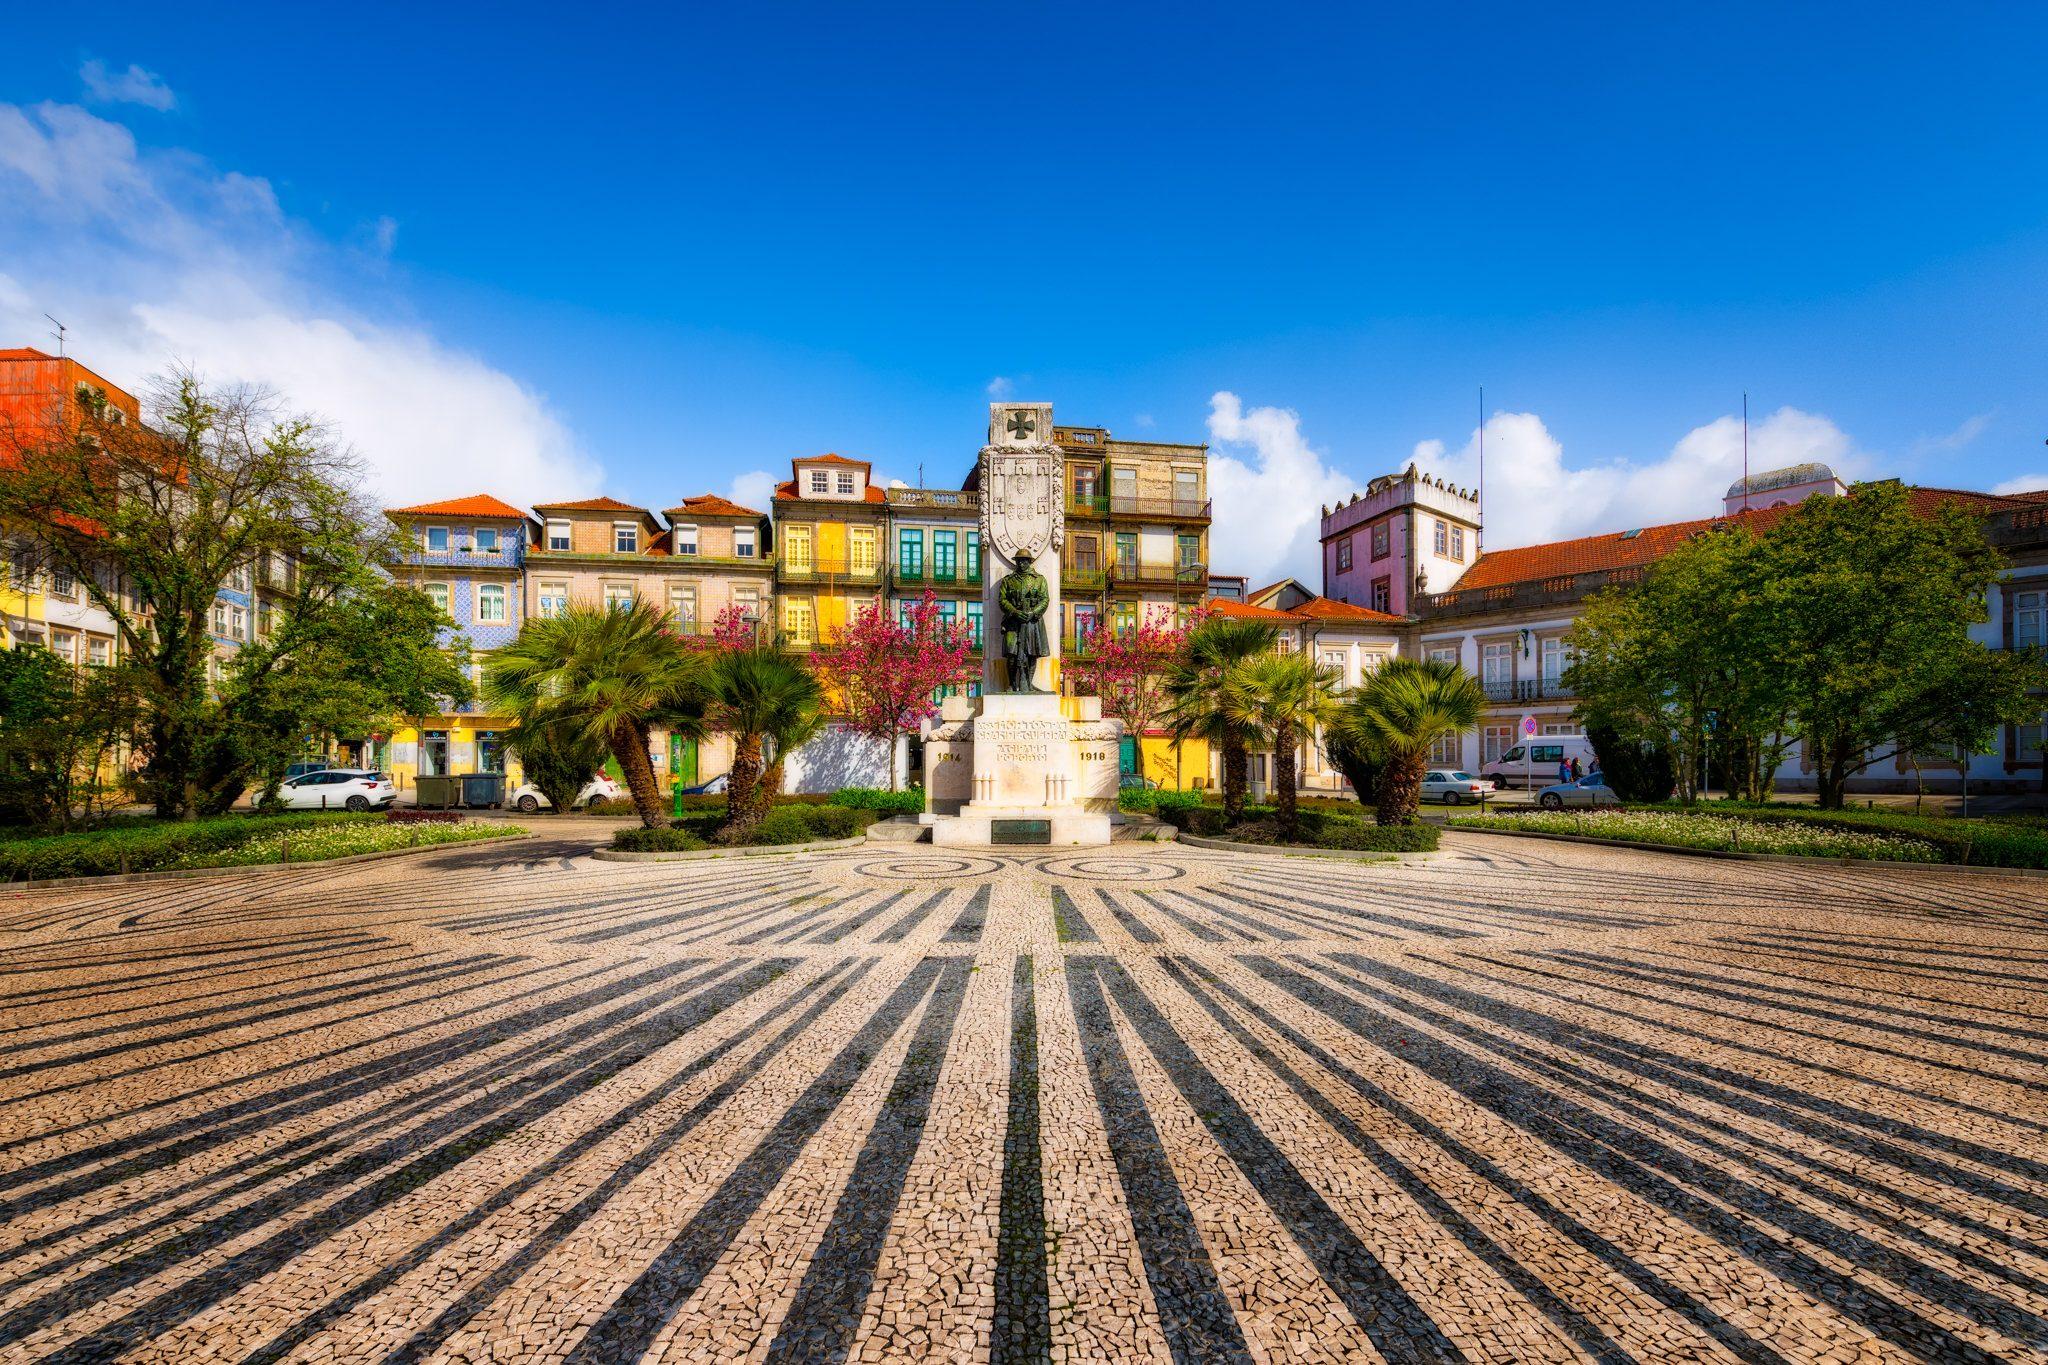 Porto Praça de Carlos Alberto an einem sonnigen Tag, Portugal.